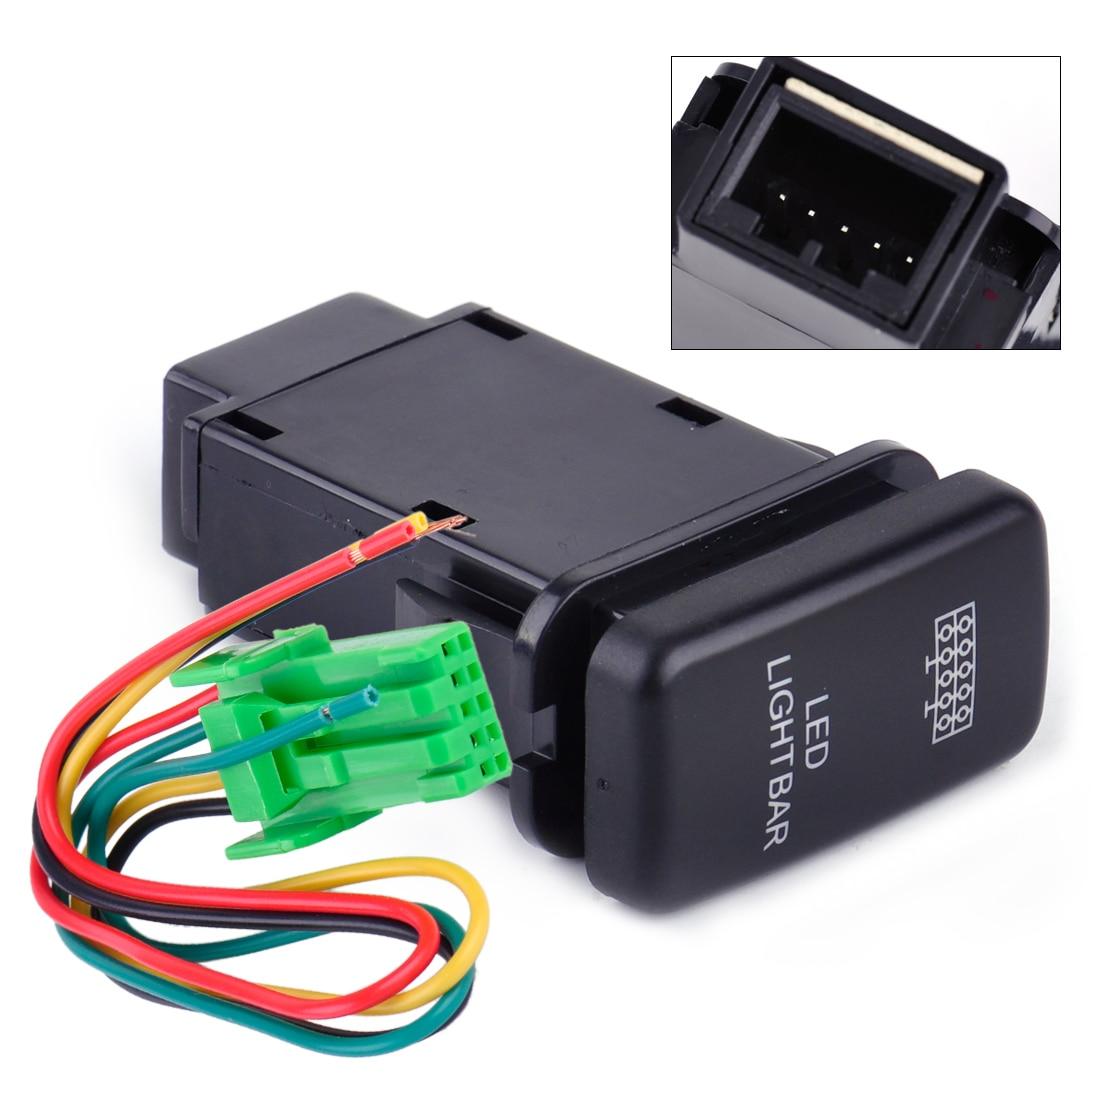 DWCX 12 V Auto ABS & Metall 5 Pin Blau Led-lichtleiste On-off ...